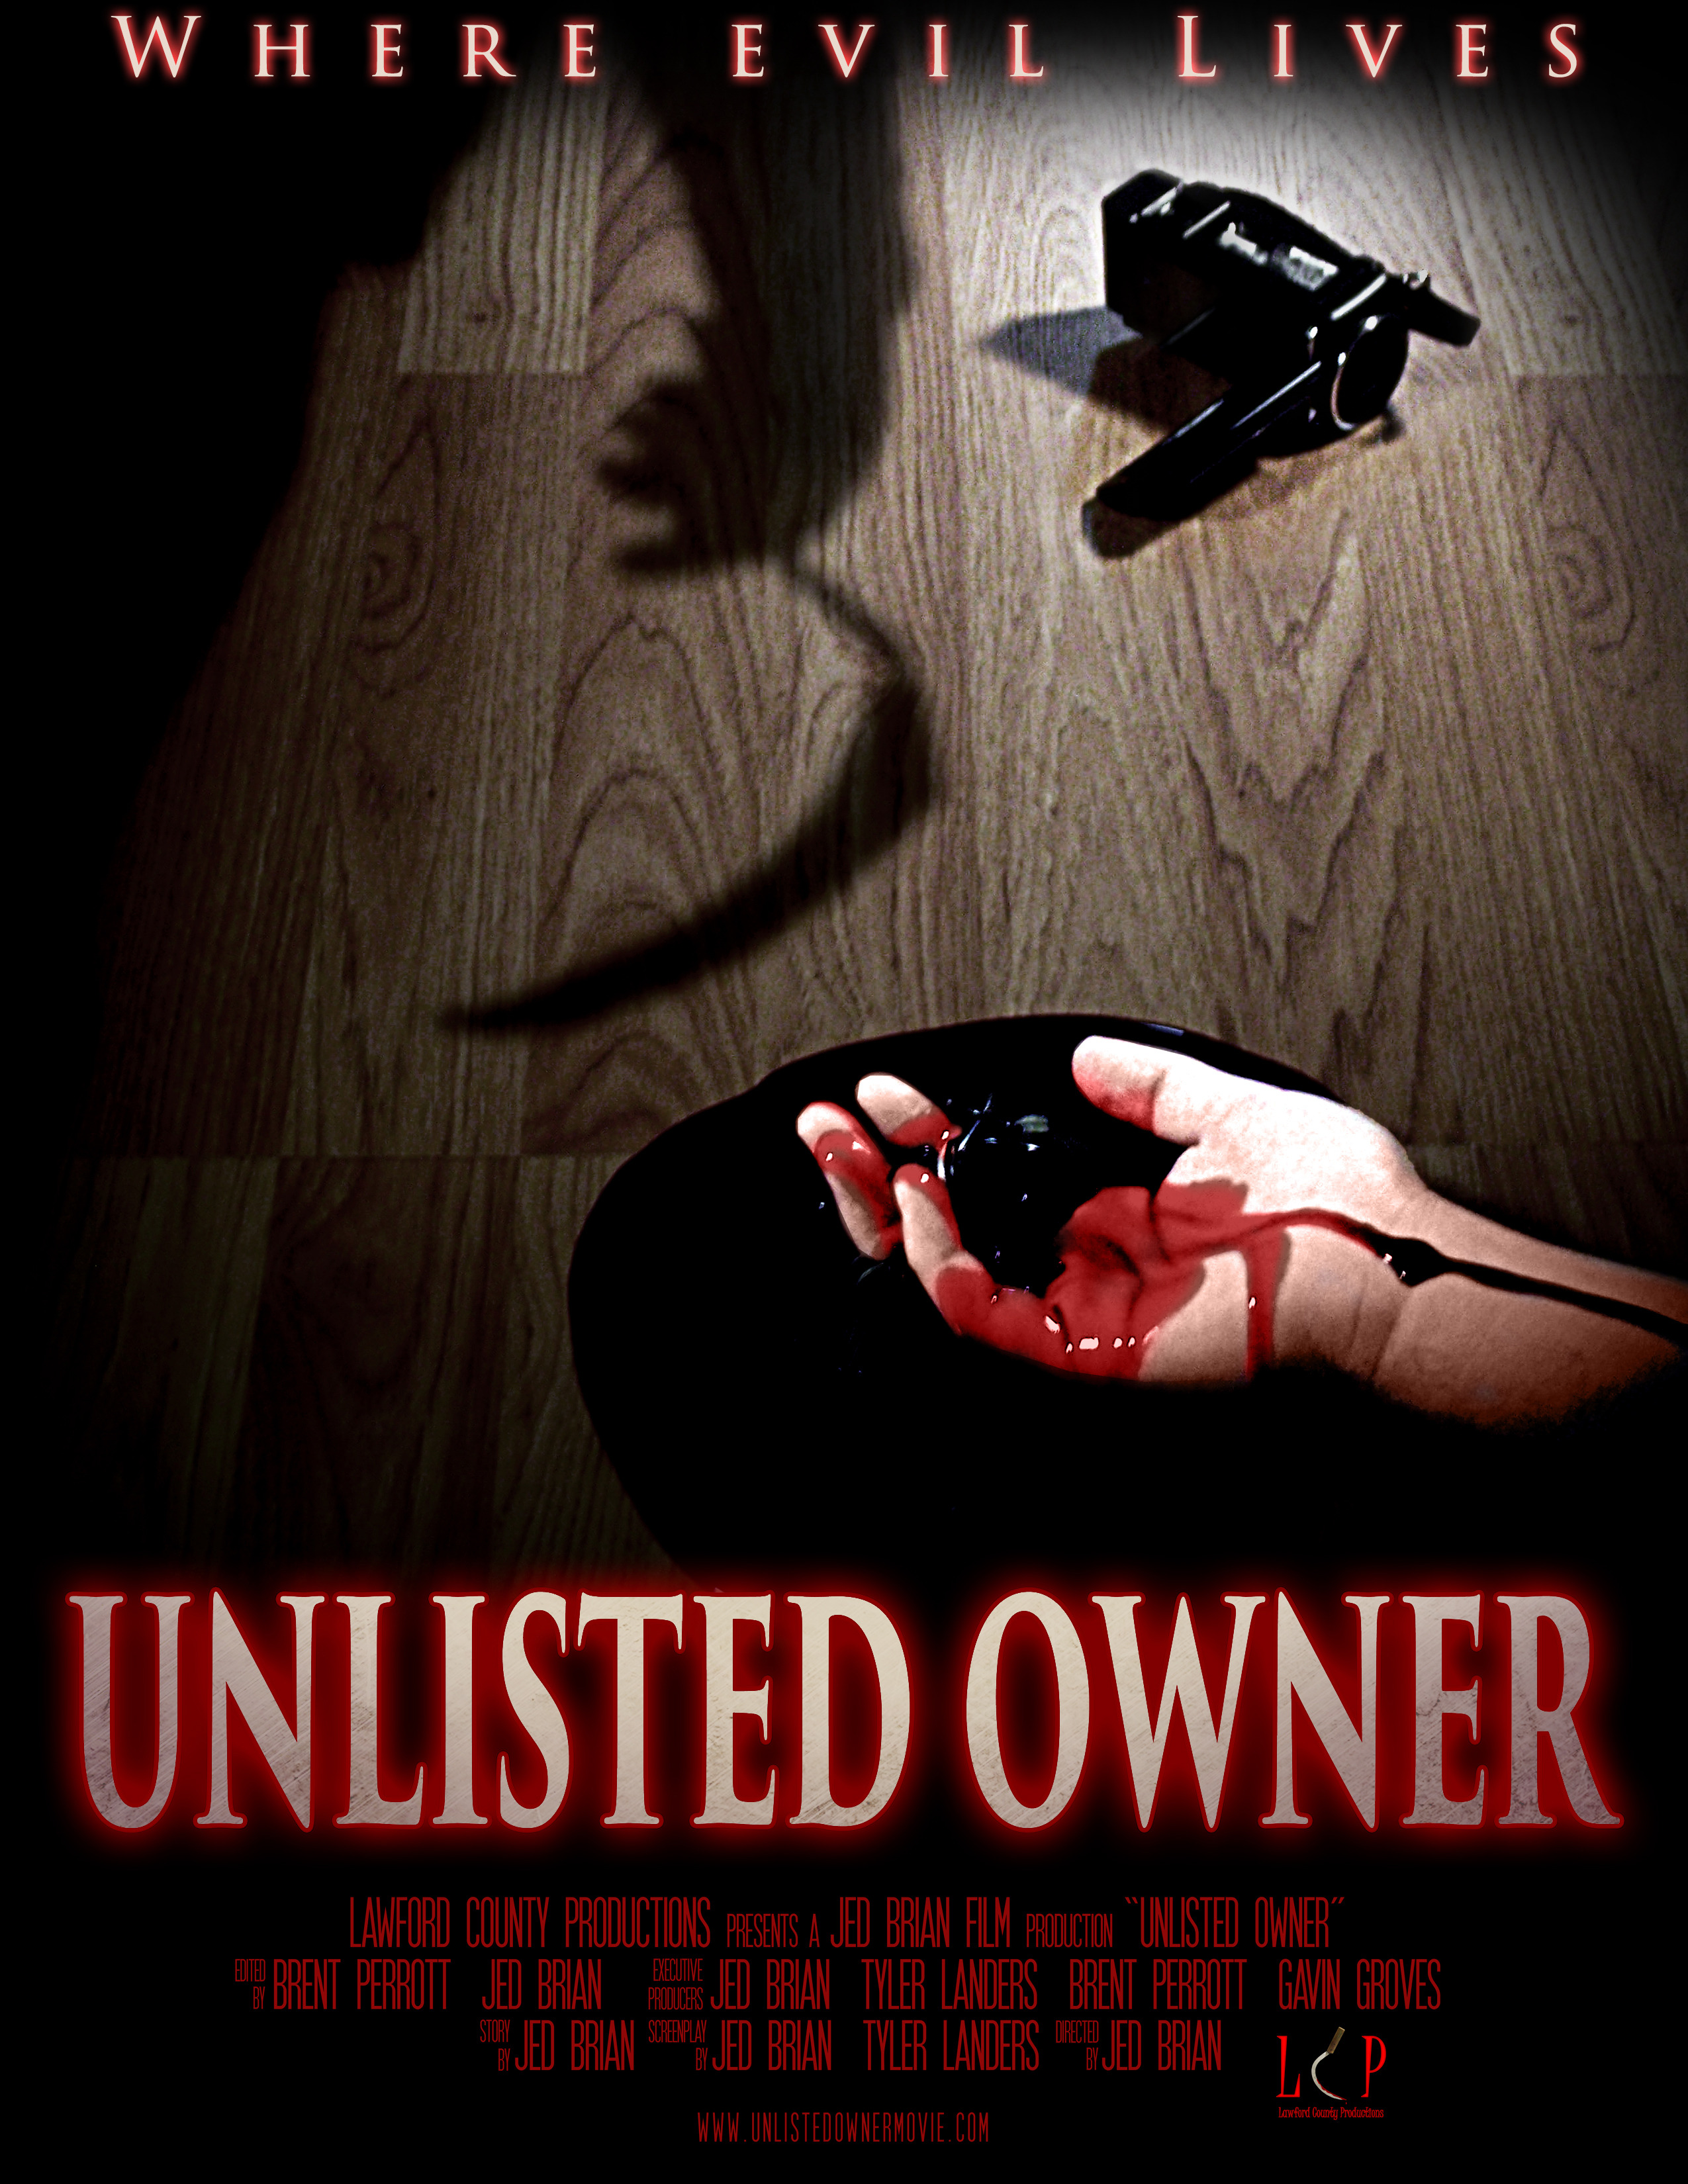 UnlistedOwner